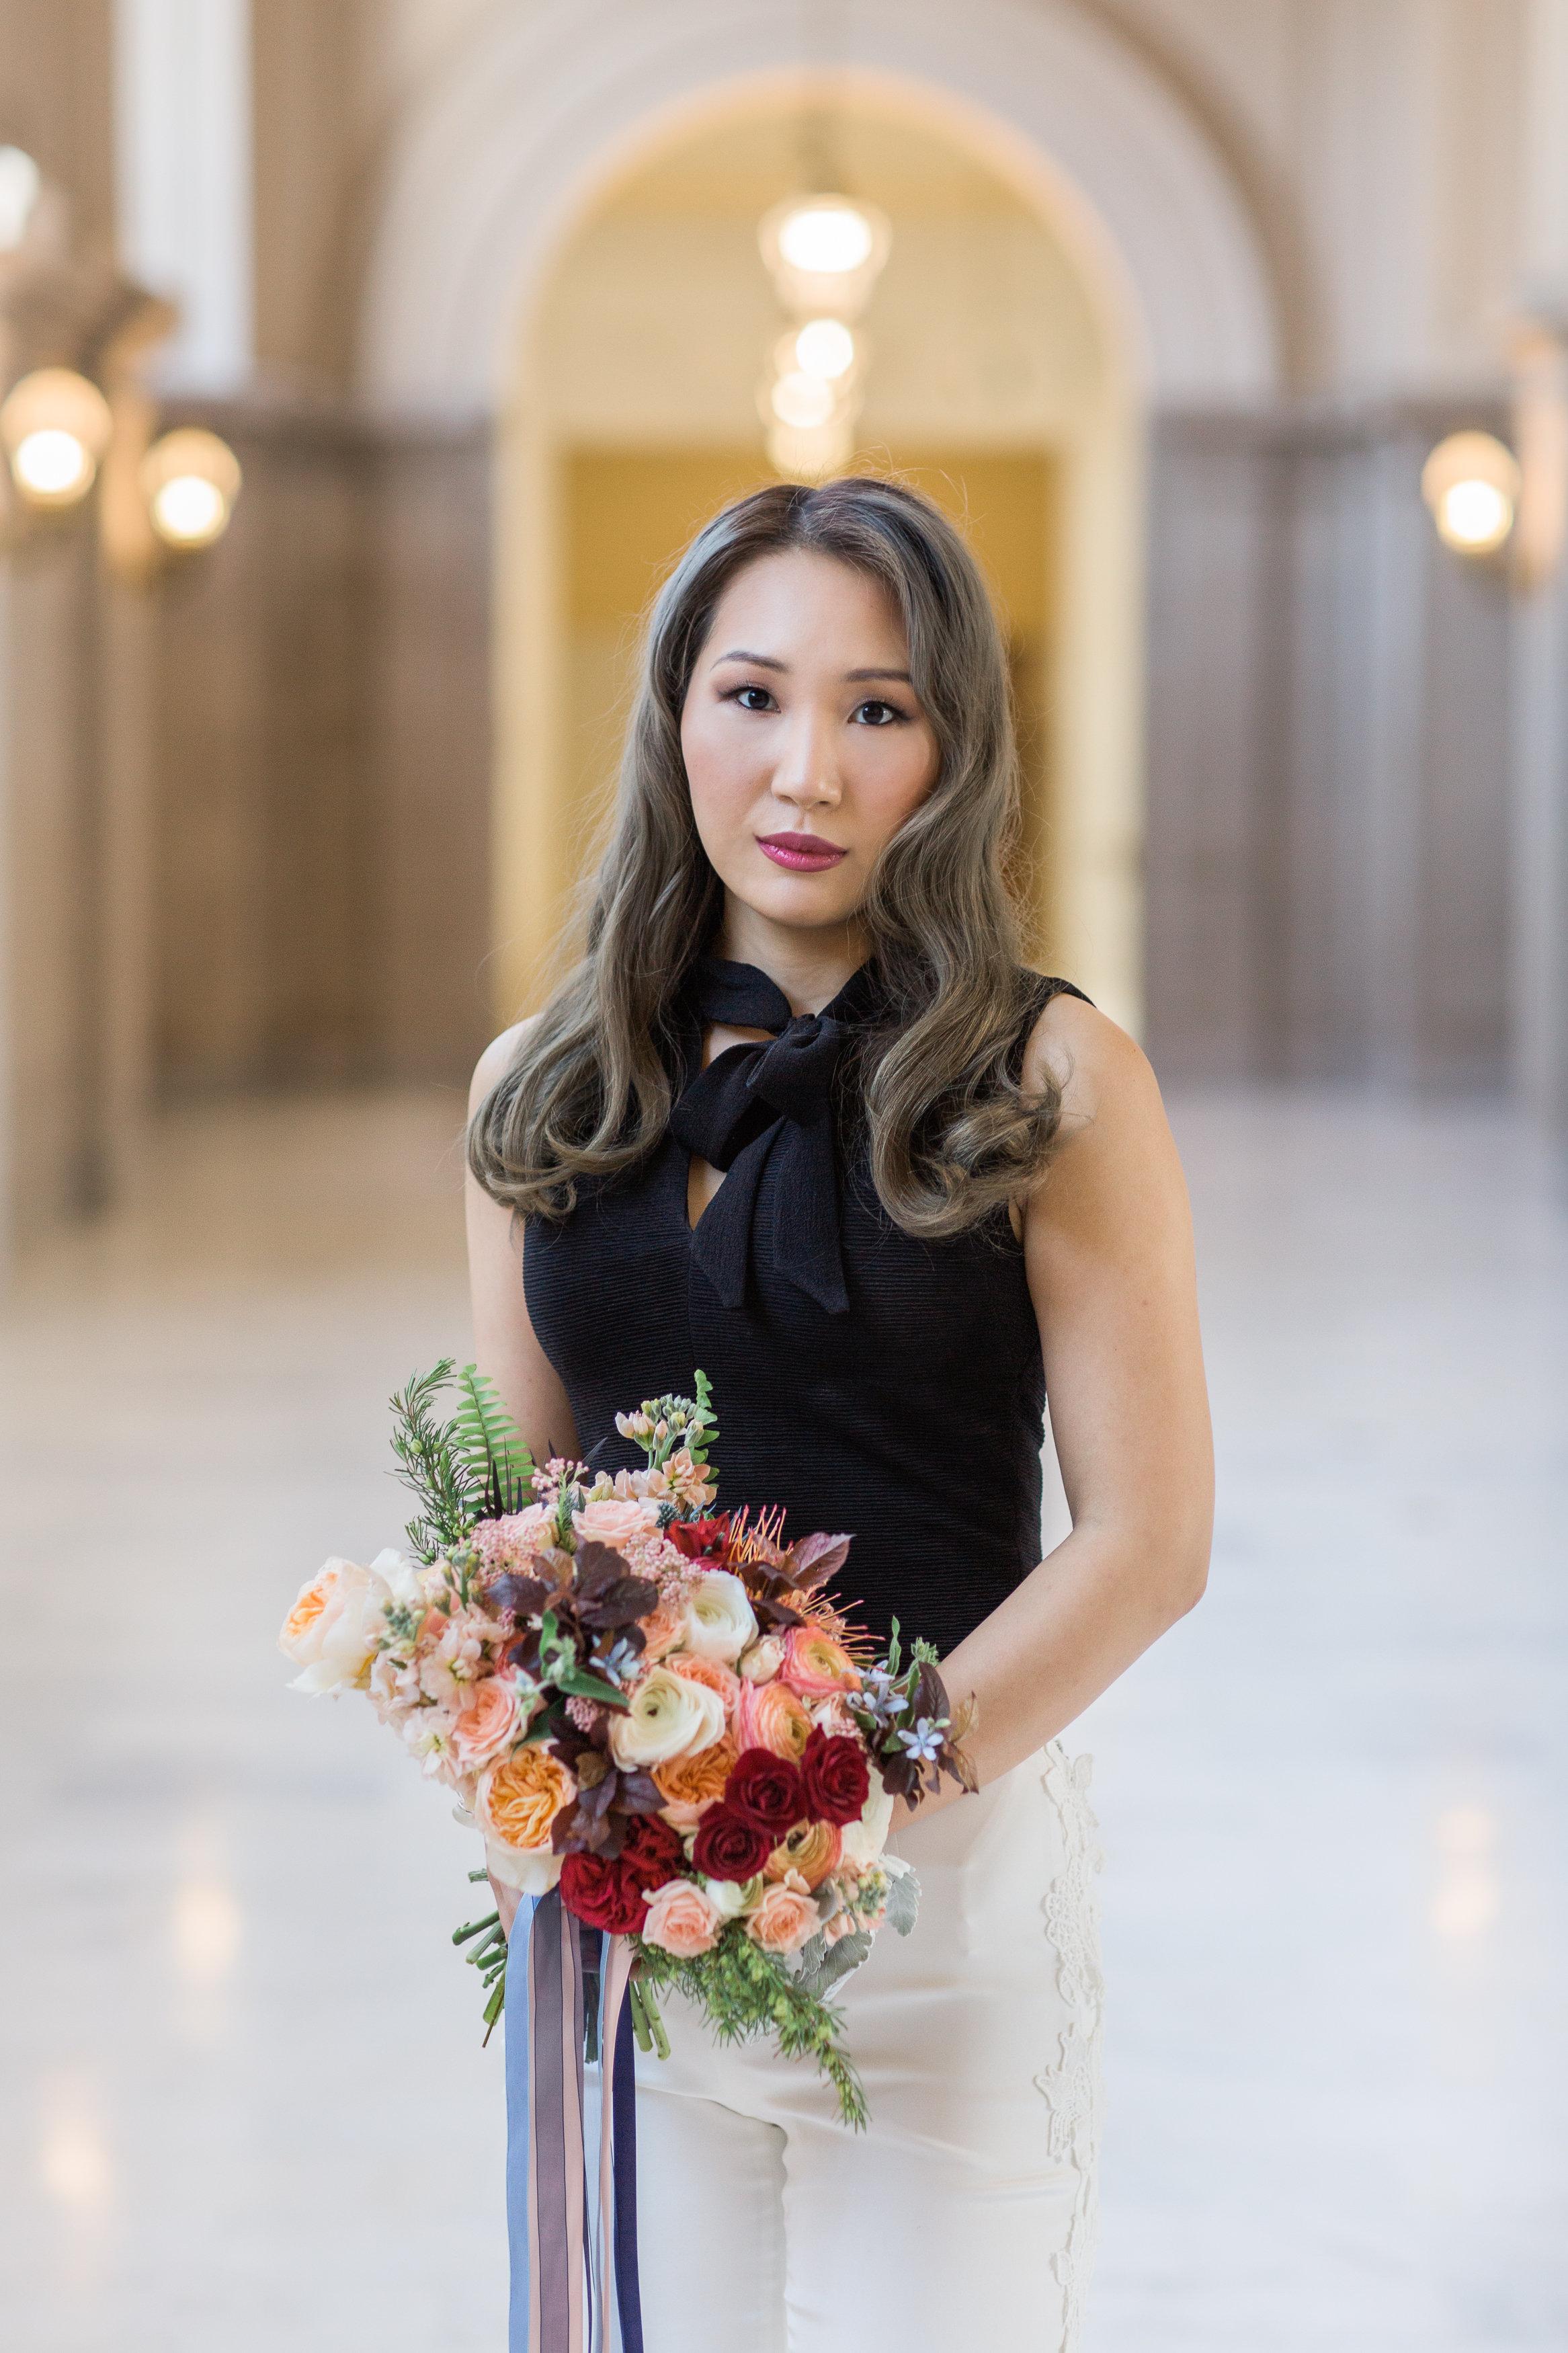 San Francisco City Hall Lesbian LGBTQ Elopement Styled Wedding Shoot by Buena Lane Photography